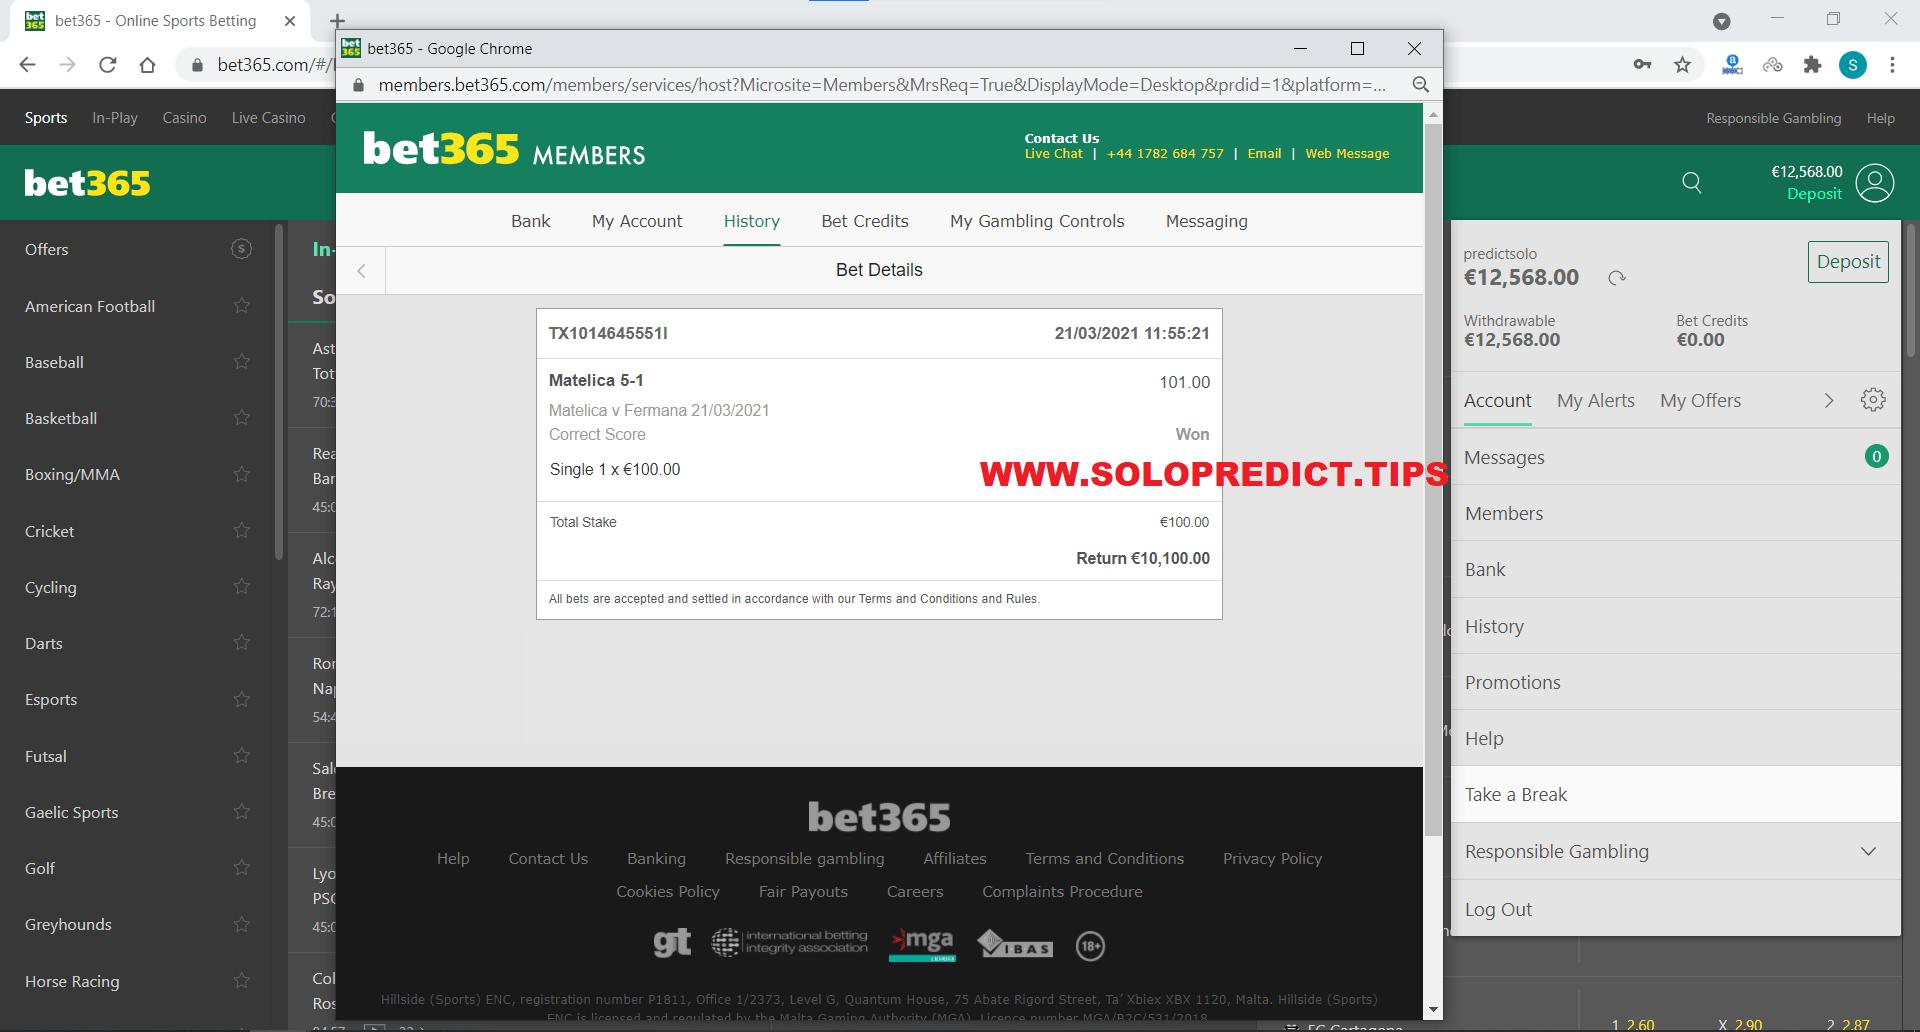 SOLOBET SOLO PREDICTION FIXED MATCHES WON CORRECT SCORE